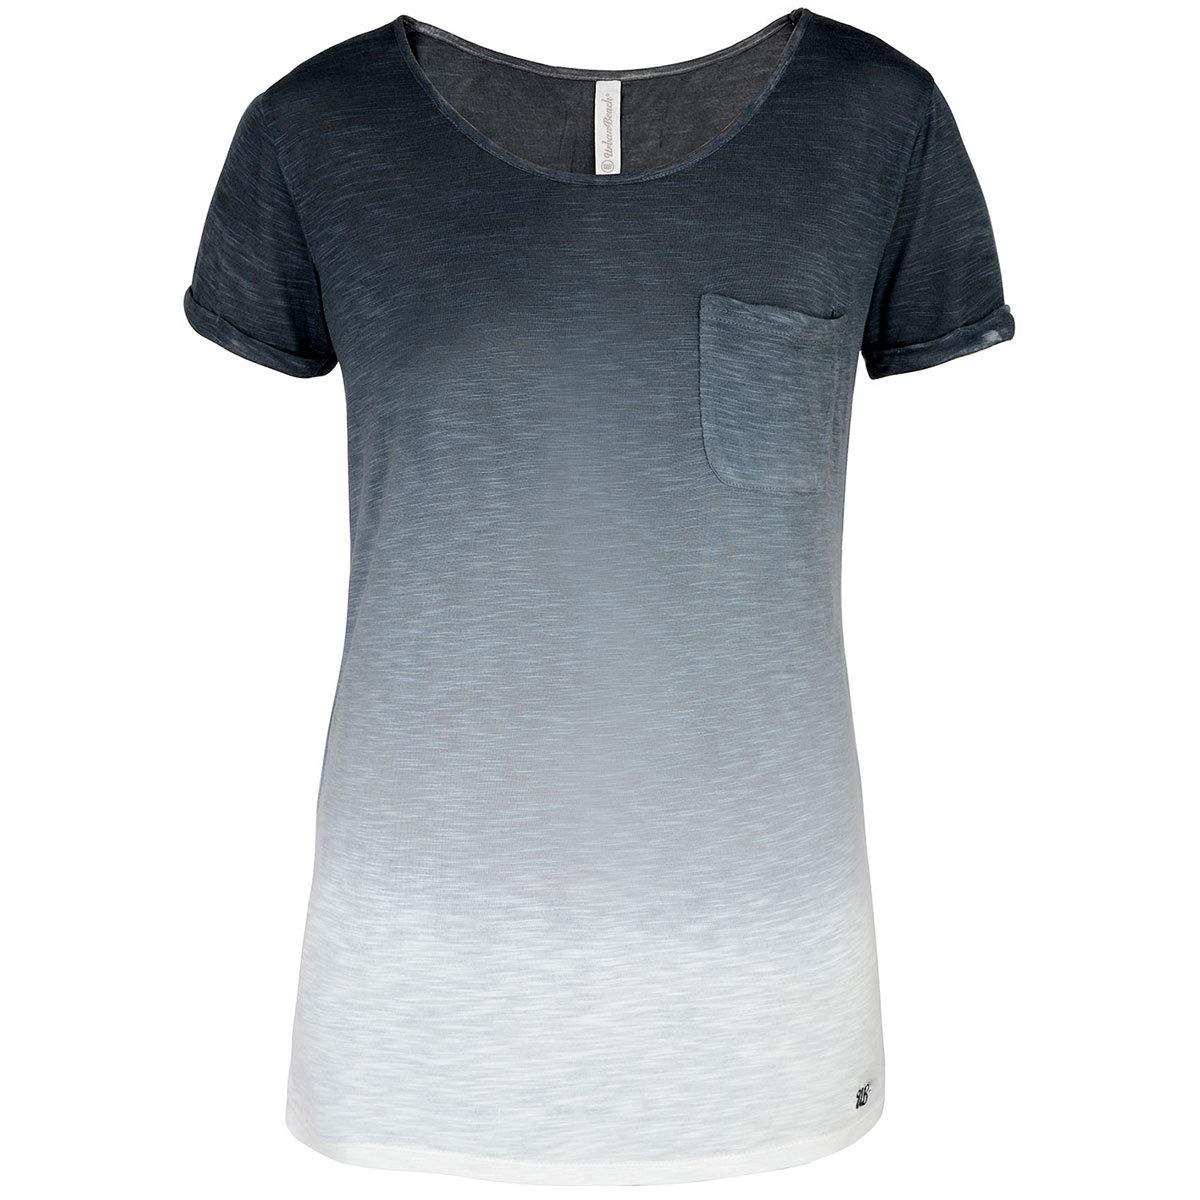 Urban Beach Women's Eleele T-Shirt - Black